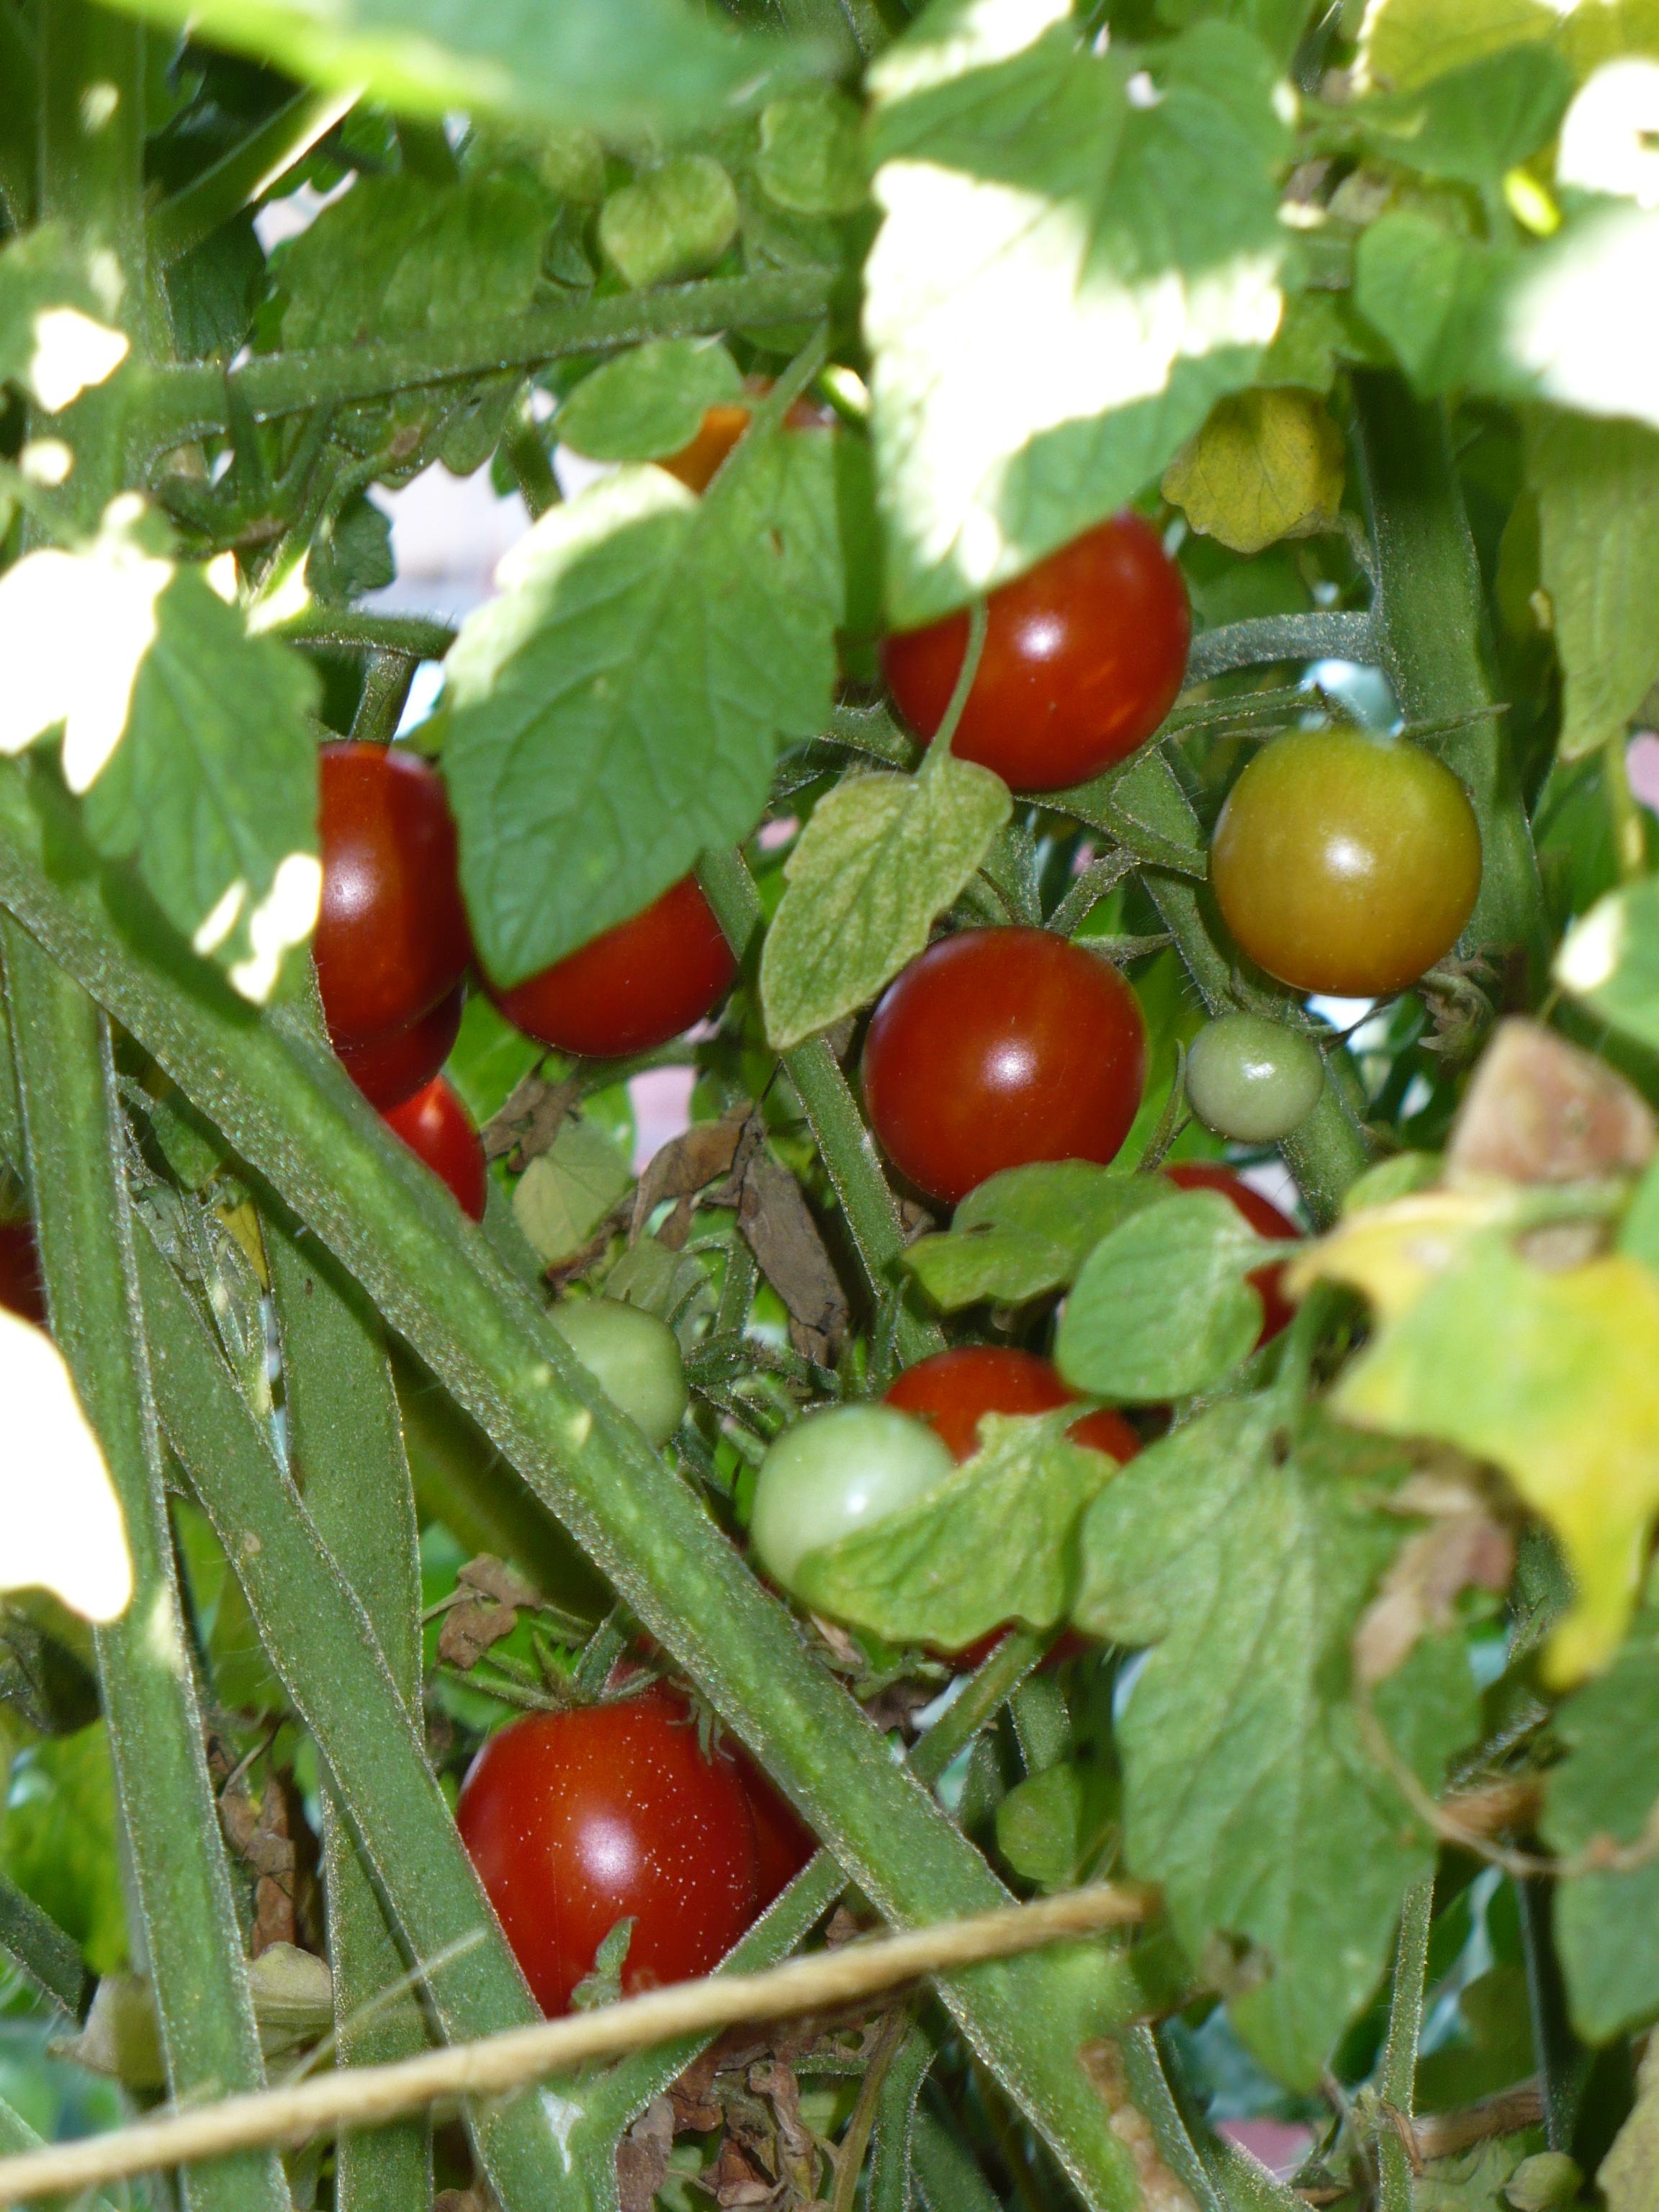 Cluster of Cherries